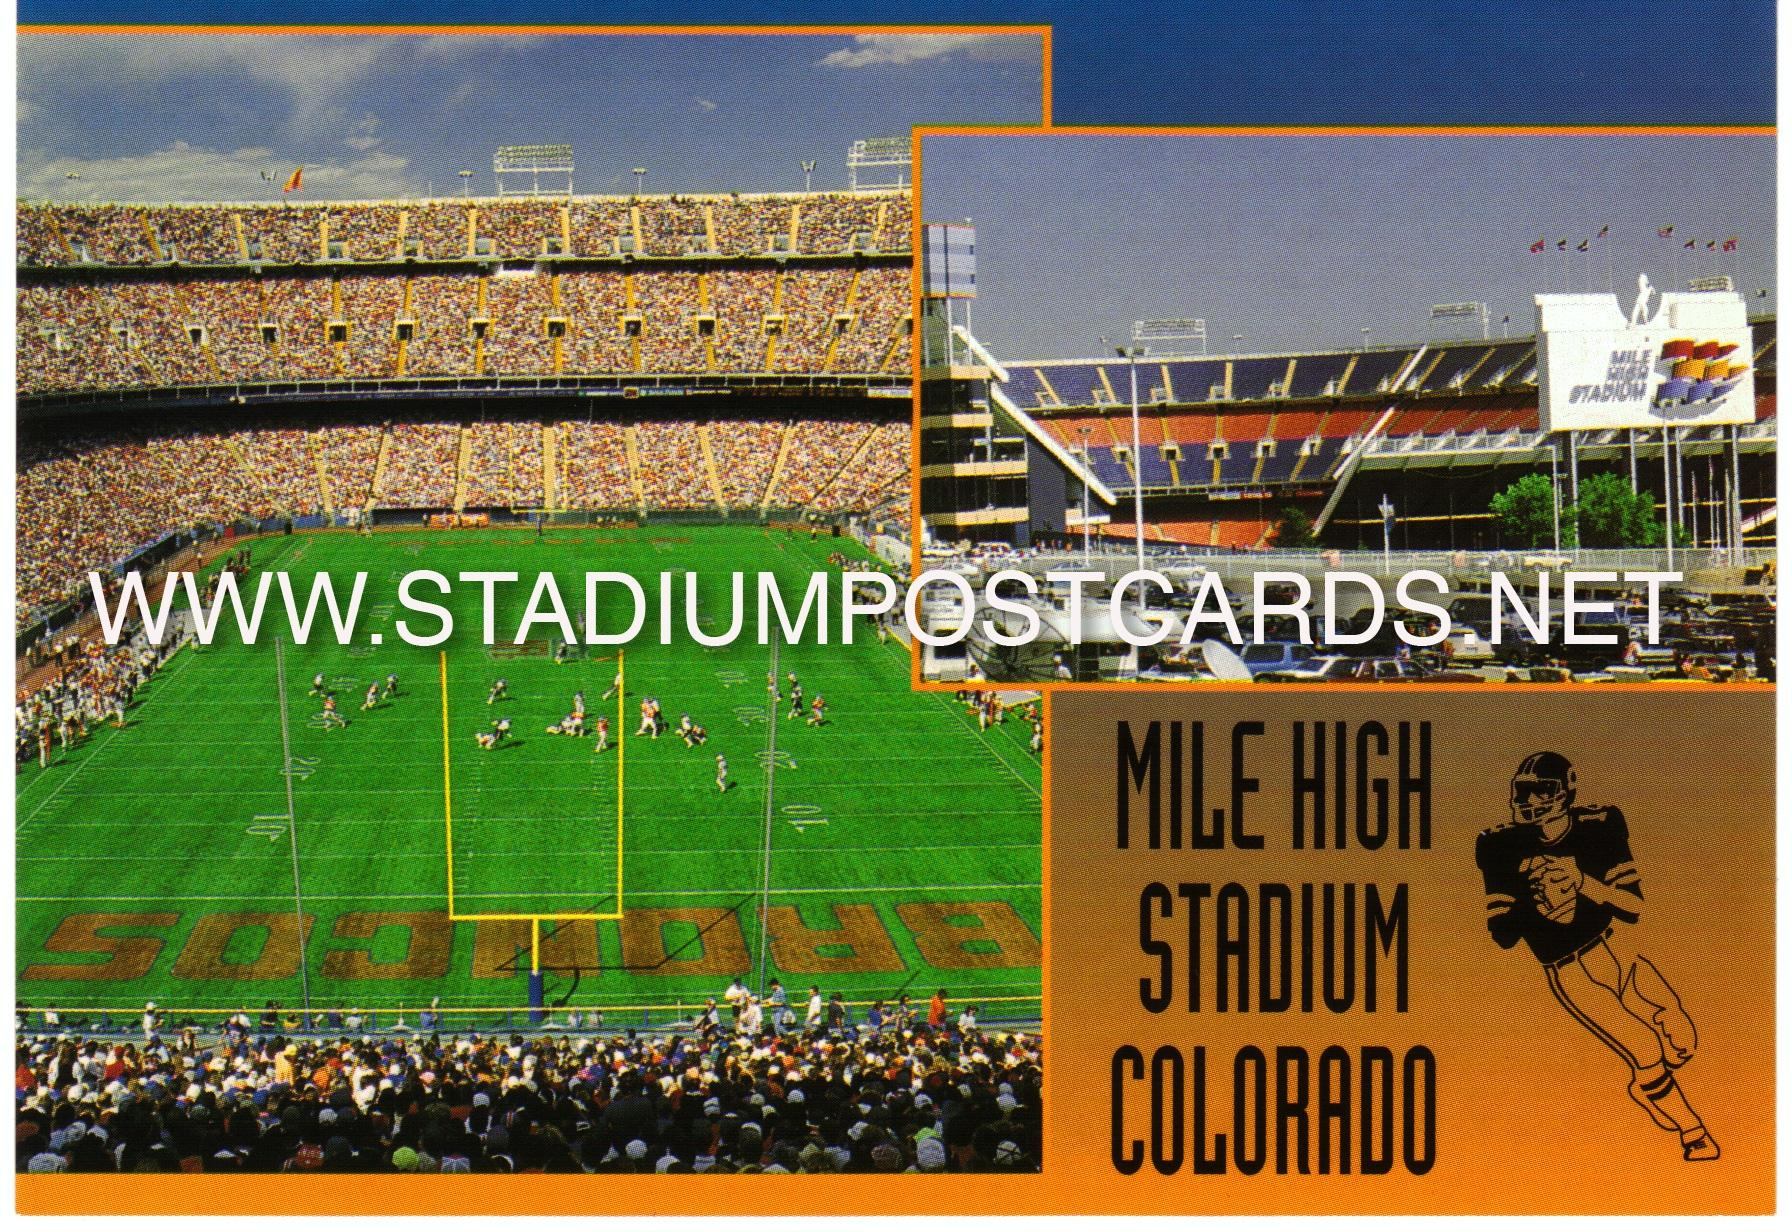 CO Denver Mile High Stadium postcard (715)